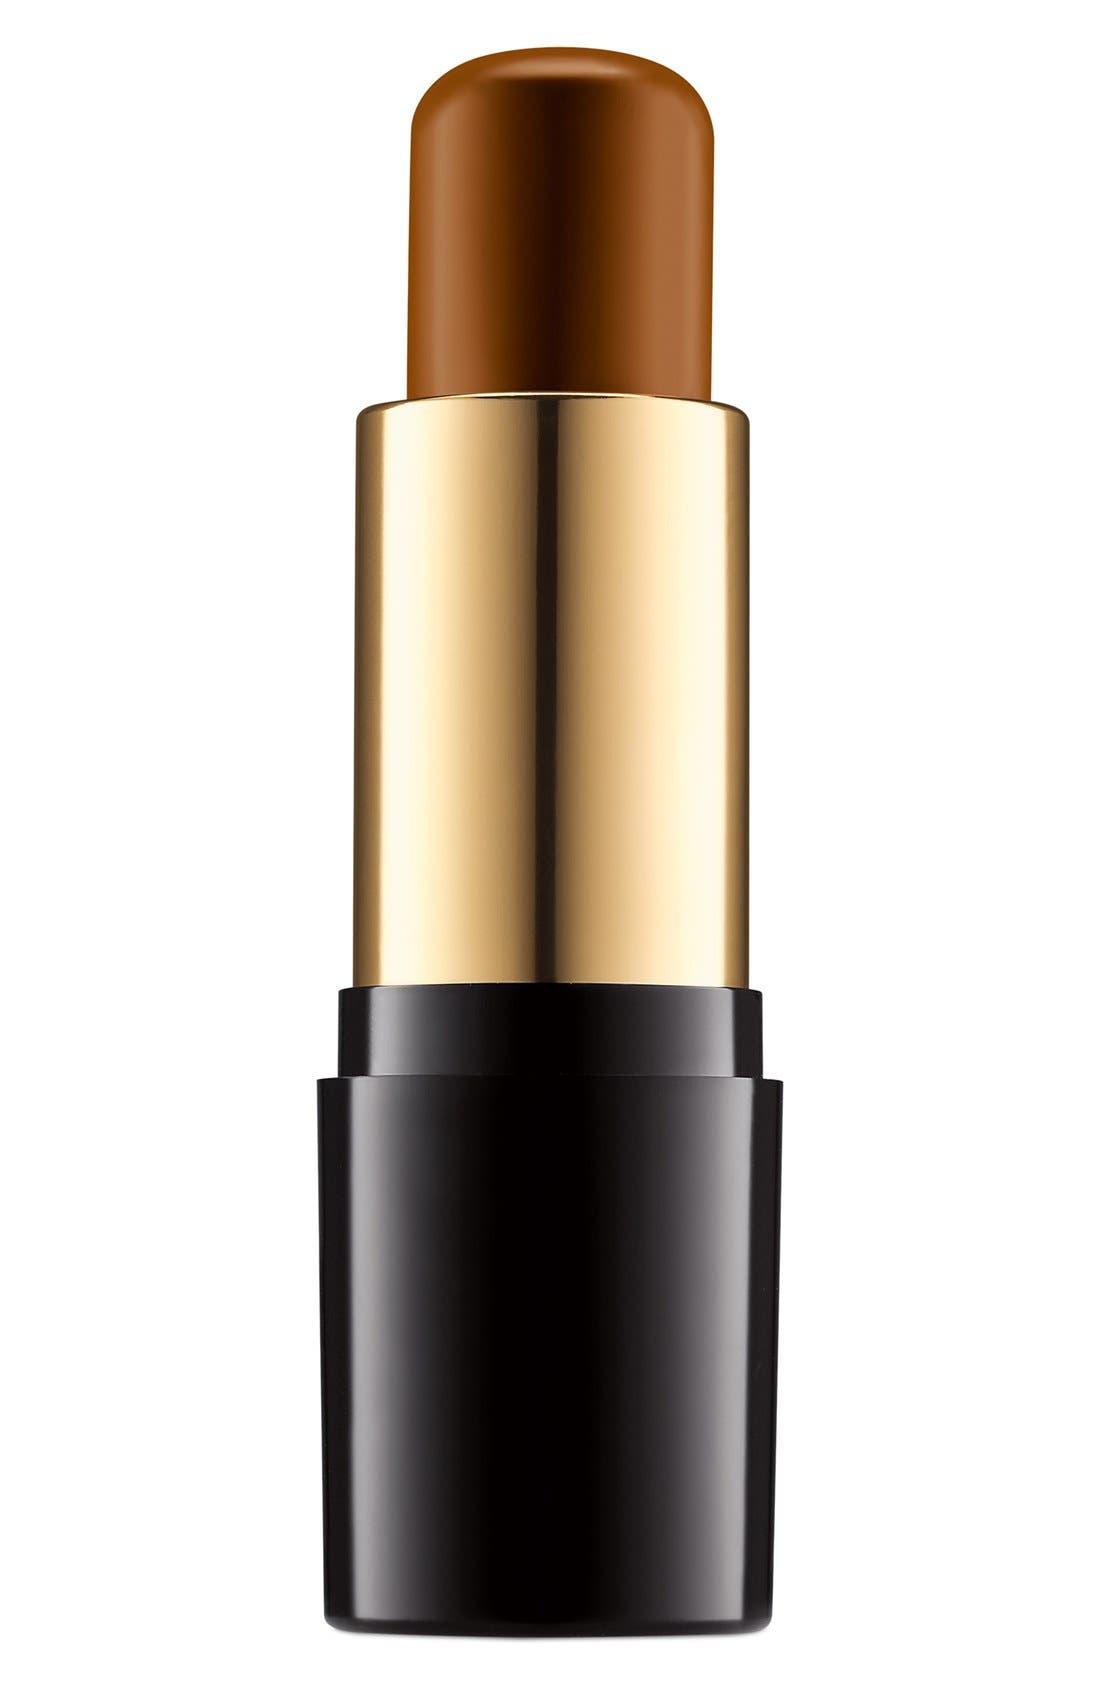 Teint Idole Ultra 24H Foundation Stick Broad Spectrum SPF 21,                         Main,                         color, 550 SUEDE C